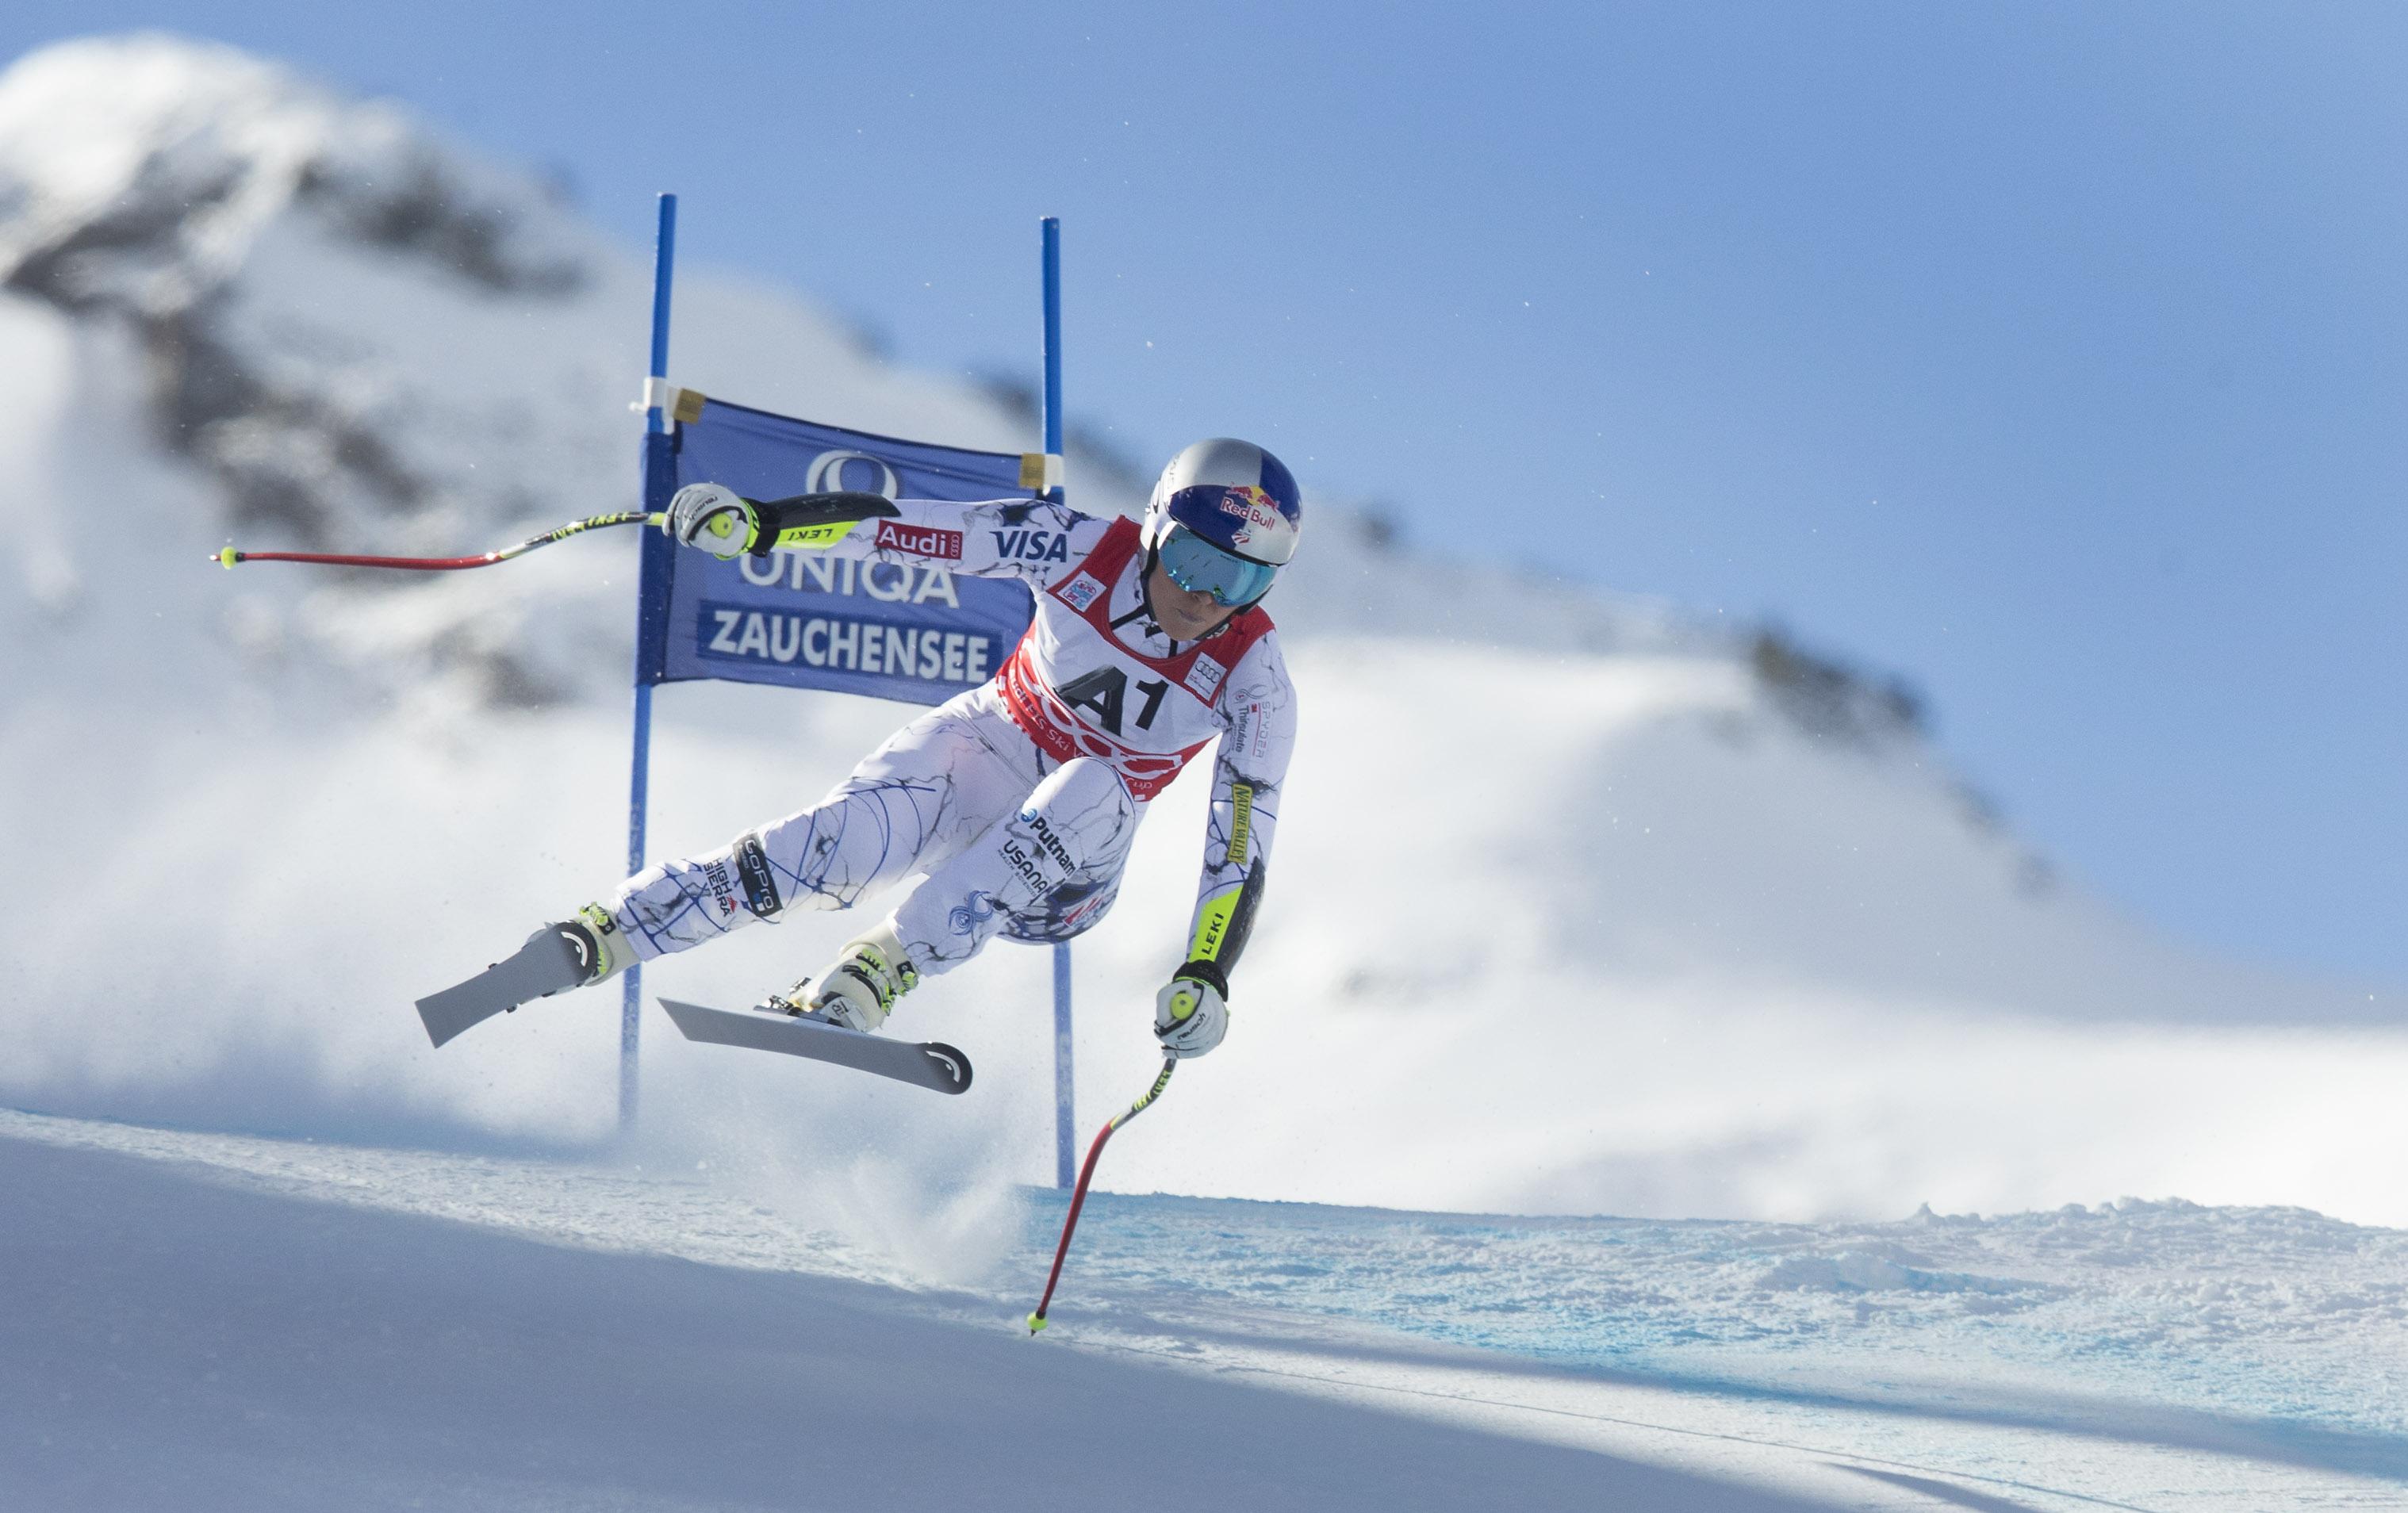 Lindsey Vonn Wins 2 World Cup Races in 2 Days - SnowBrains